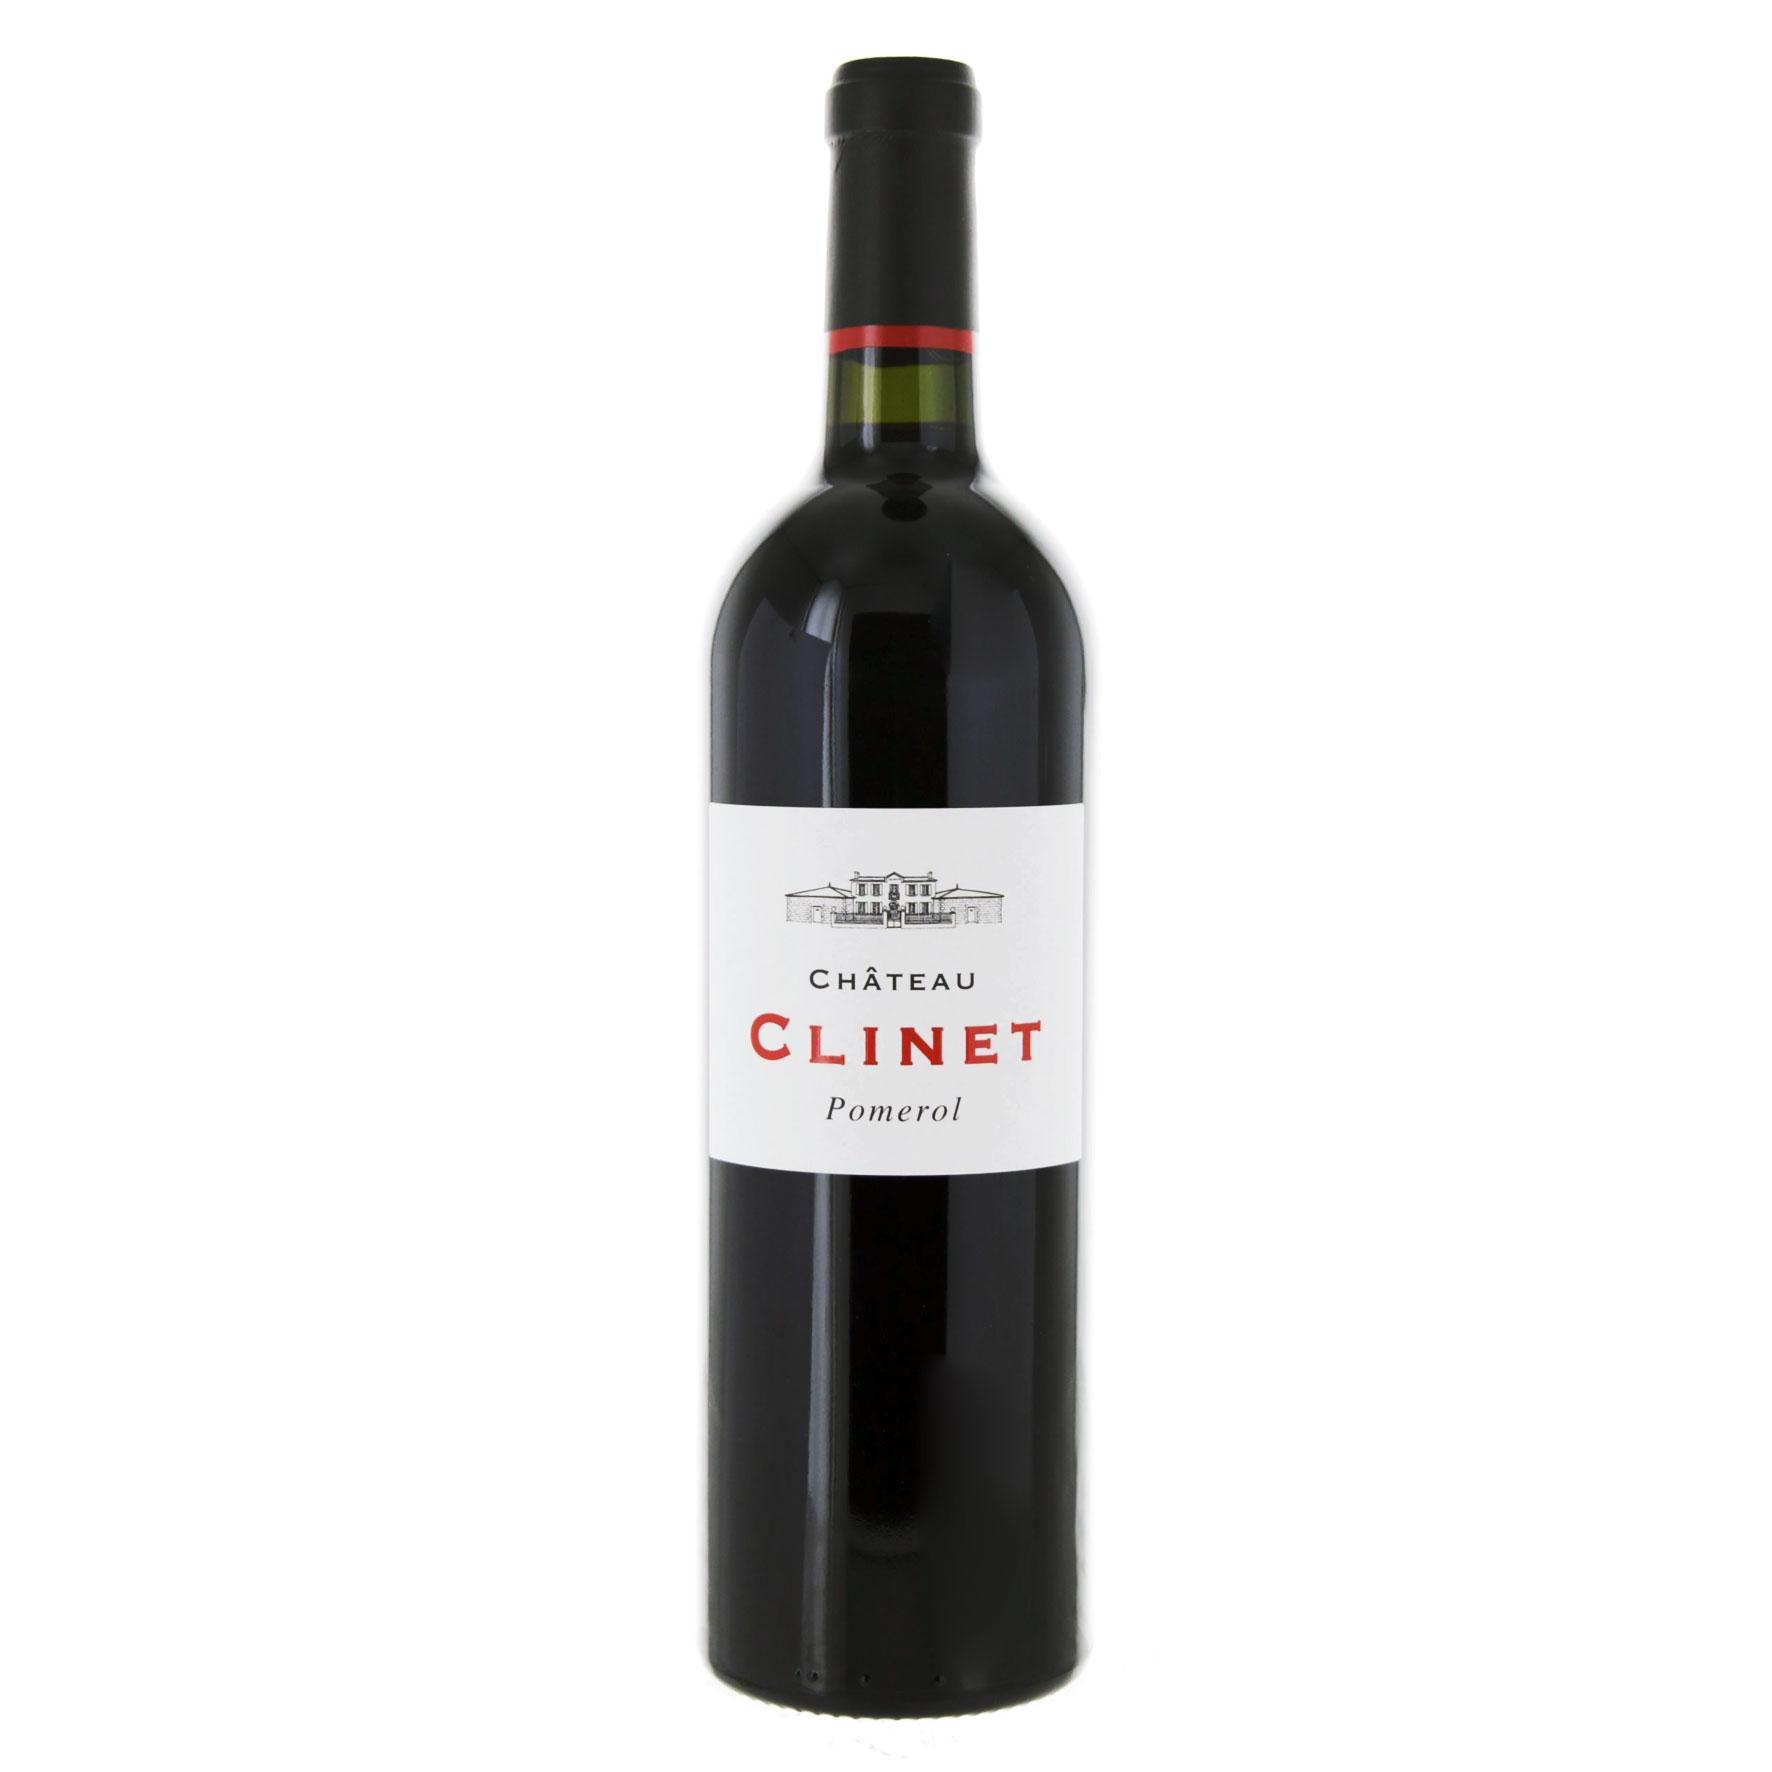 Pomerol - Château Clinet - 2015